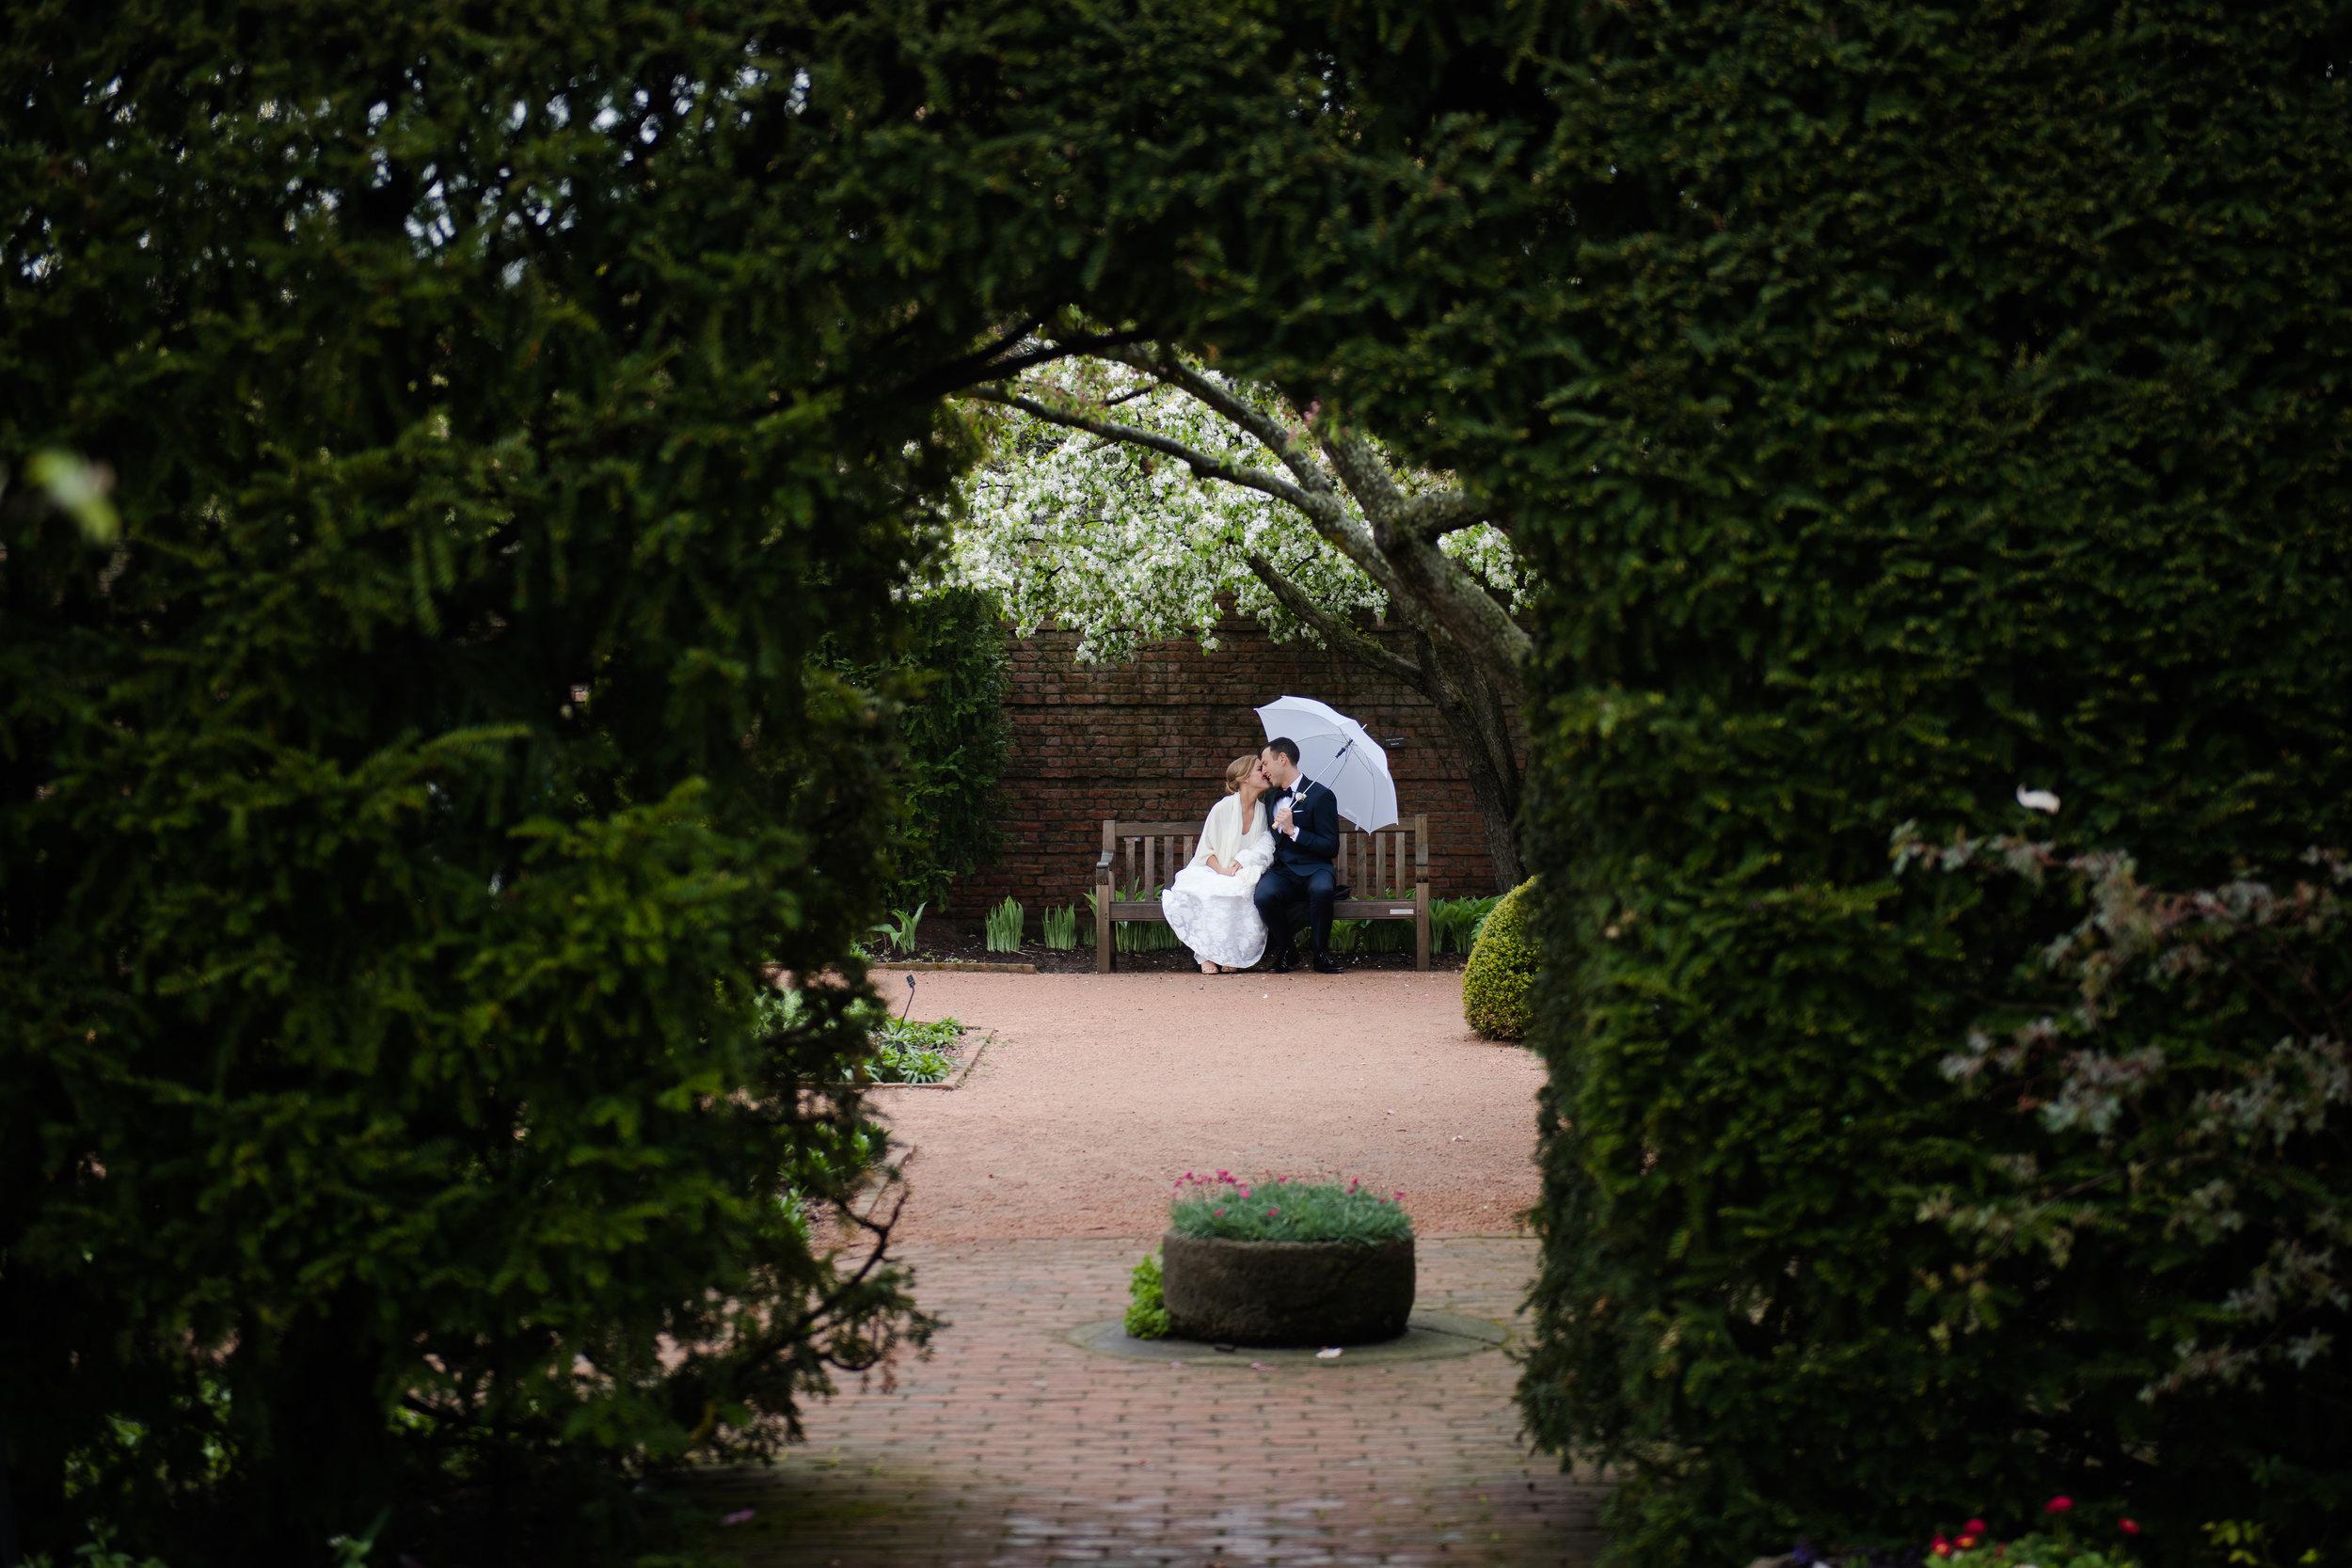 spring wedding at the chicago botanic garden29.jpg